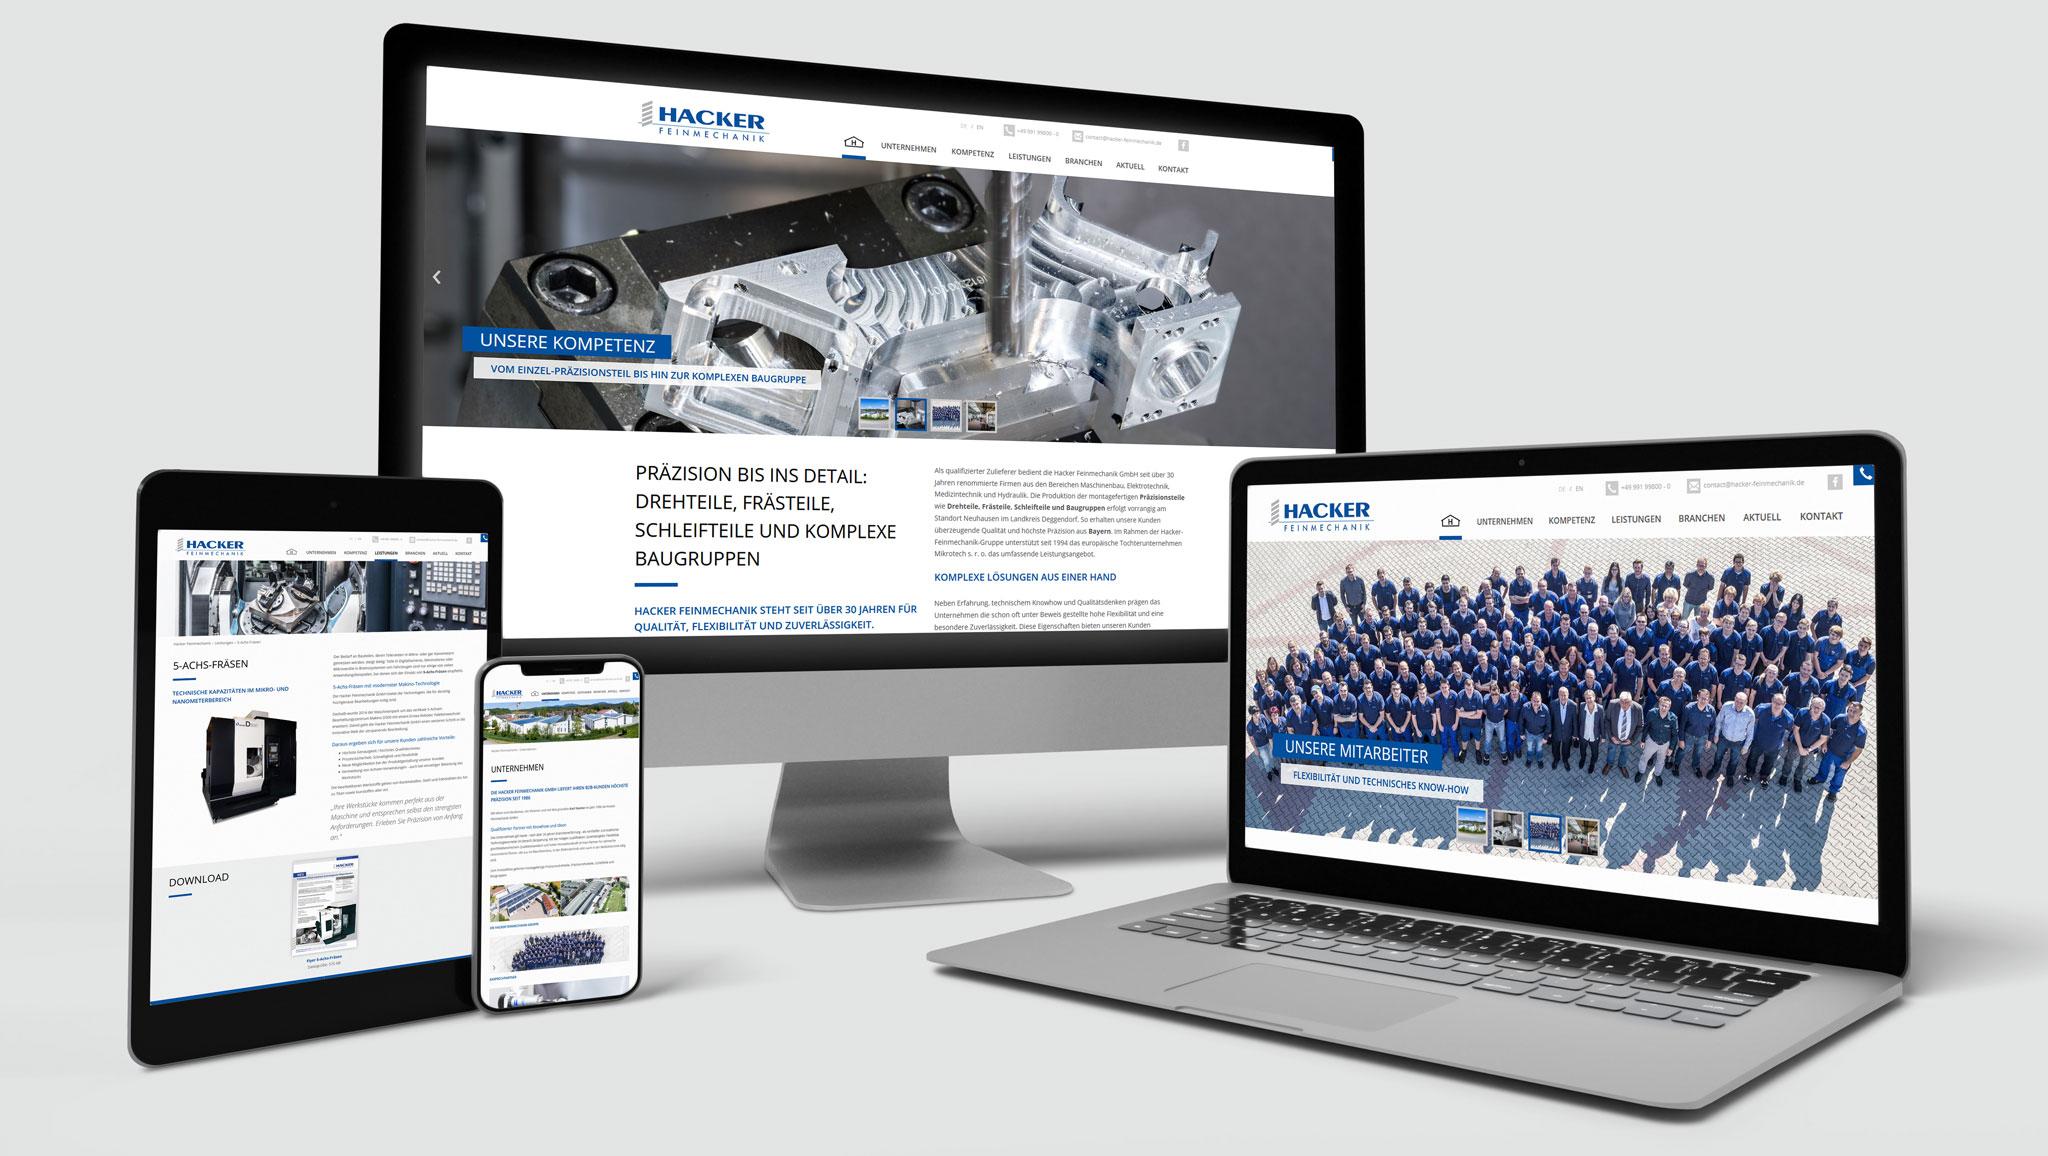 Hacker Feinmechanik Website | Werbeagentur Roland C. Ritter